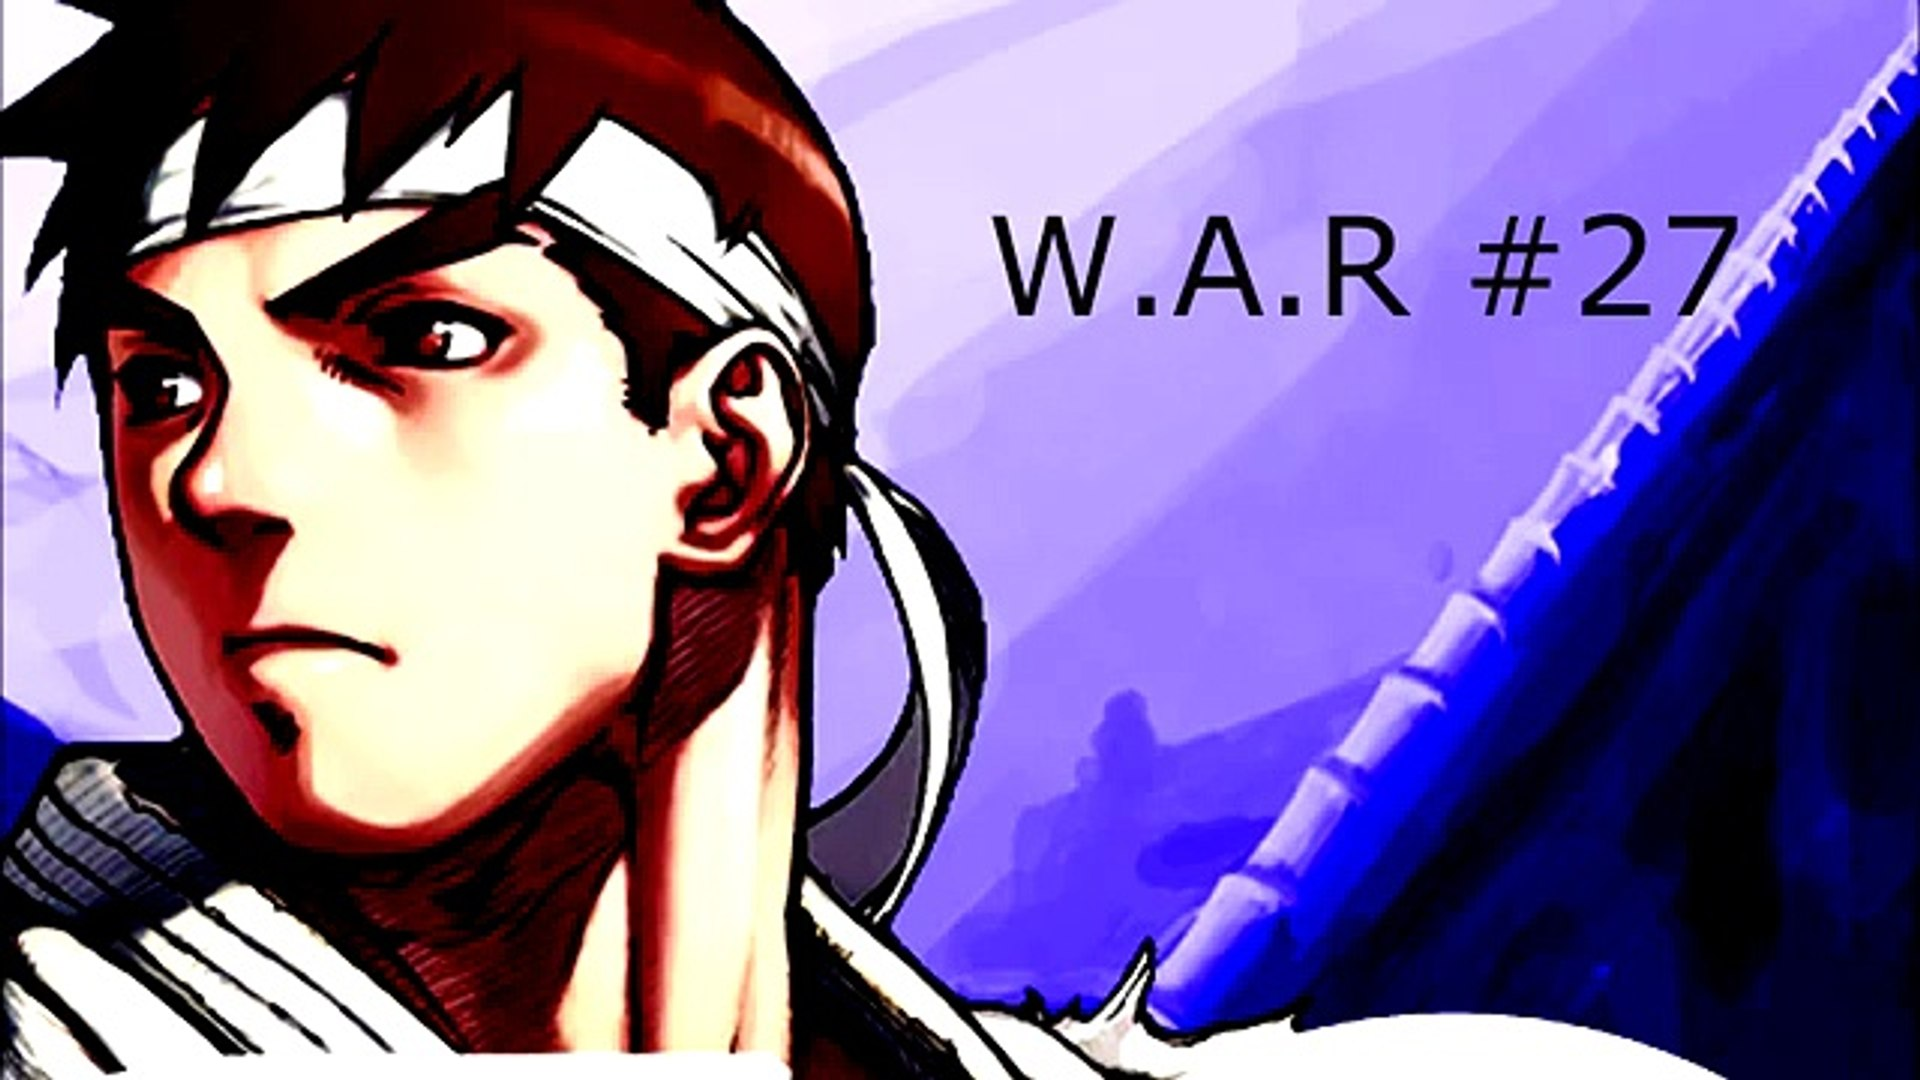 Weekly Anime Rankings #27 - NEW NiseKoi Anime , Summer 2013 Animes , WARs Final Form?